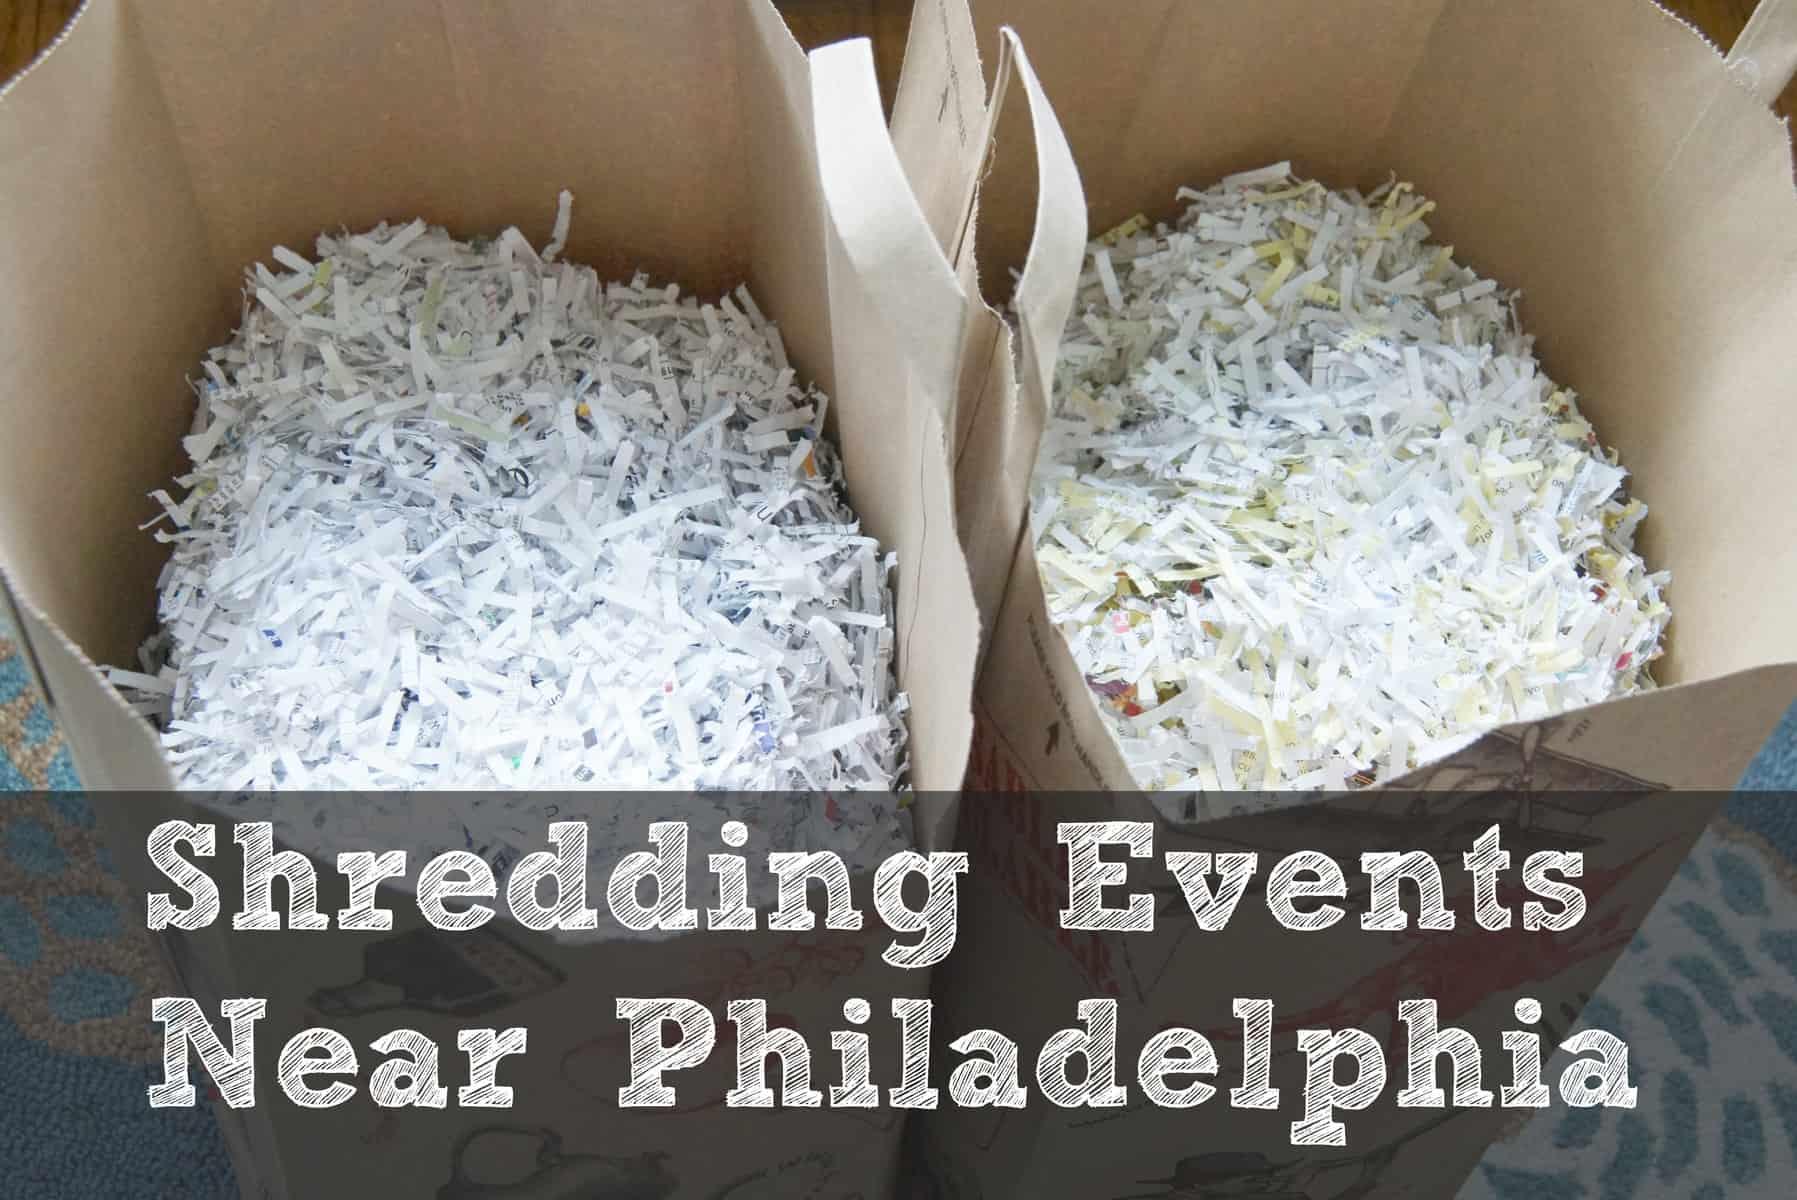 Shredding events near Philadelphia to organize paper